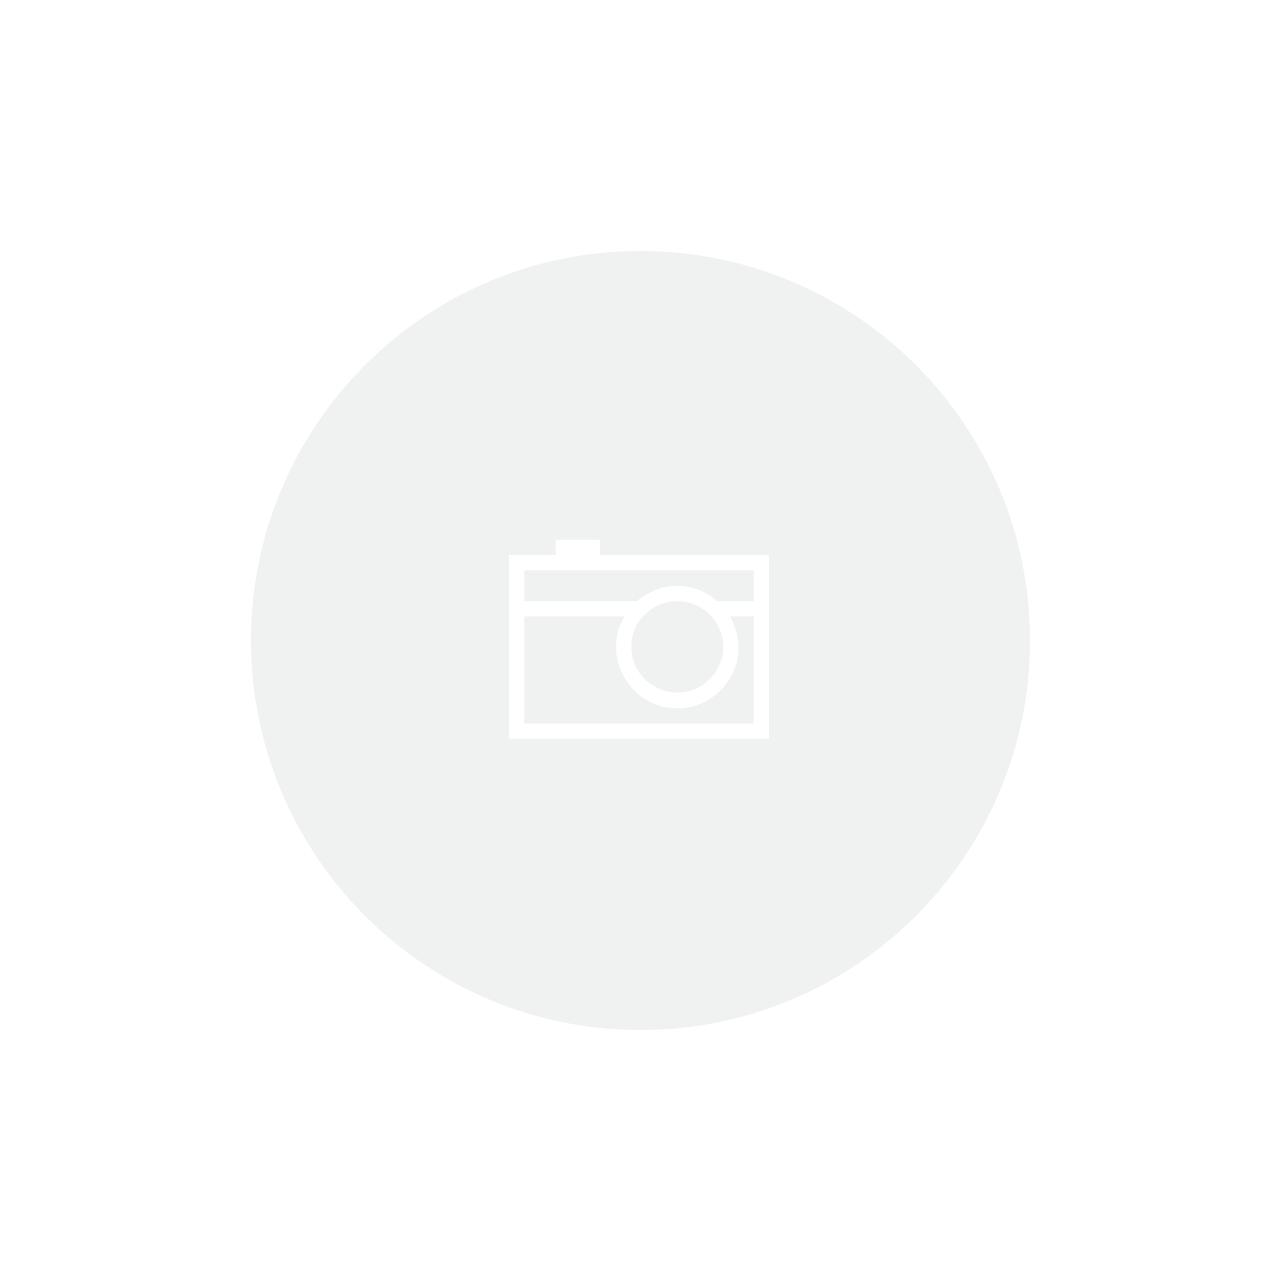 Papel Artesanal Indiano - Ref. 45